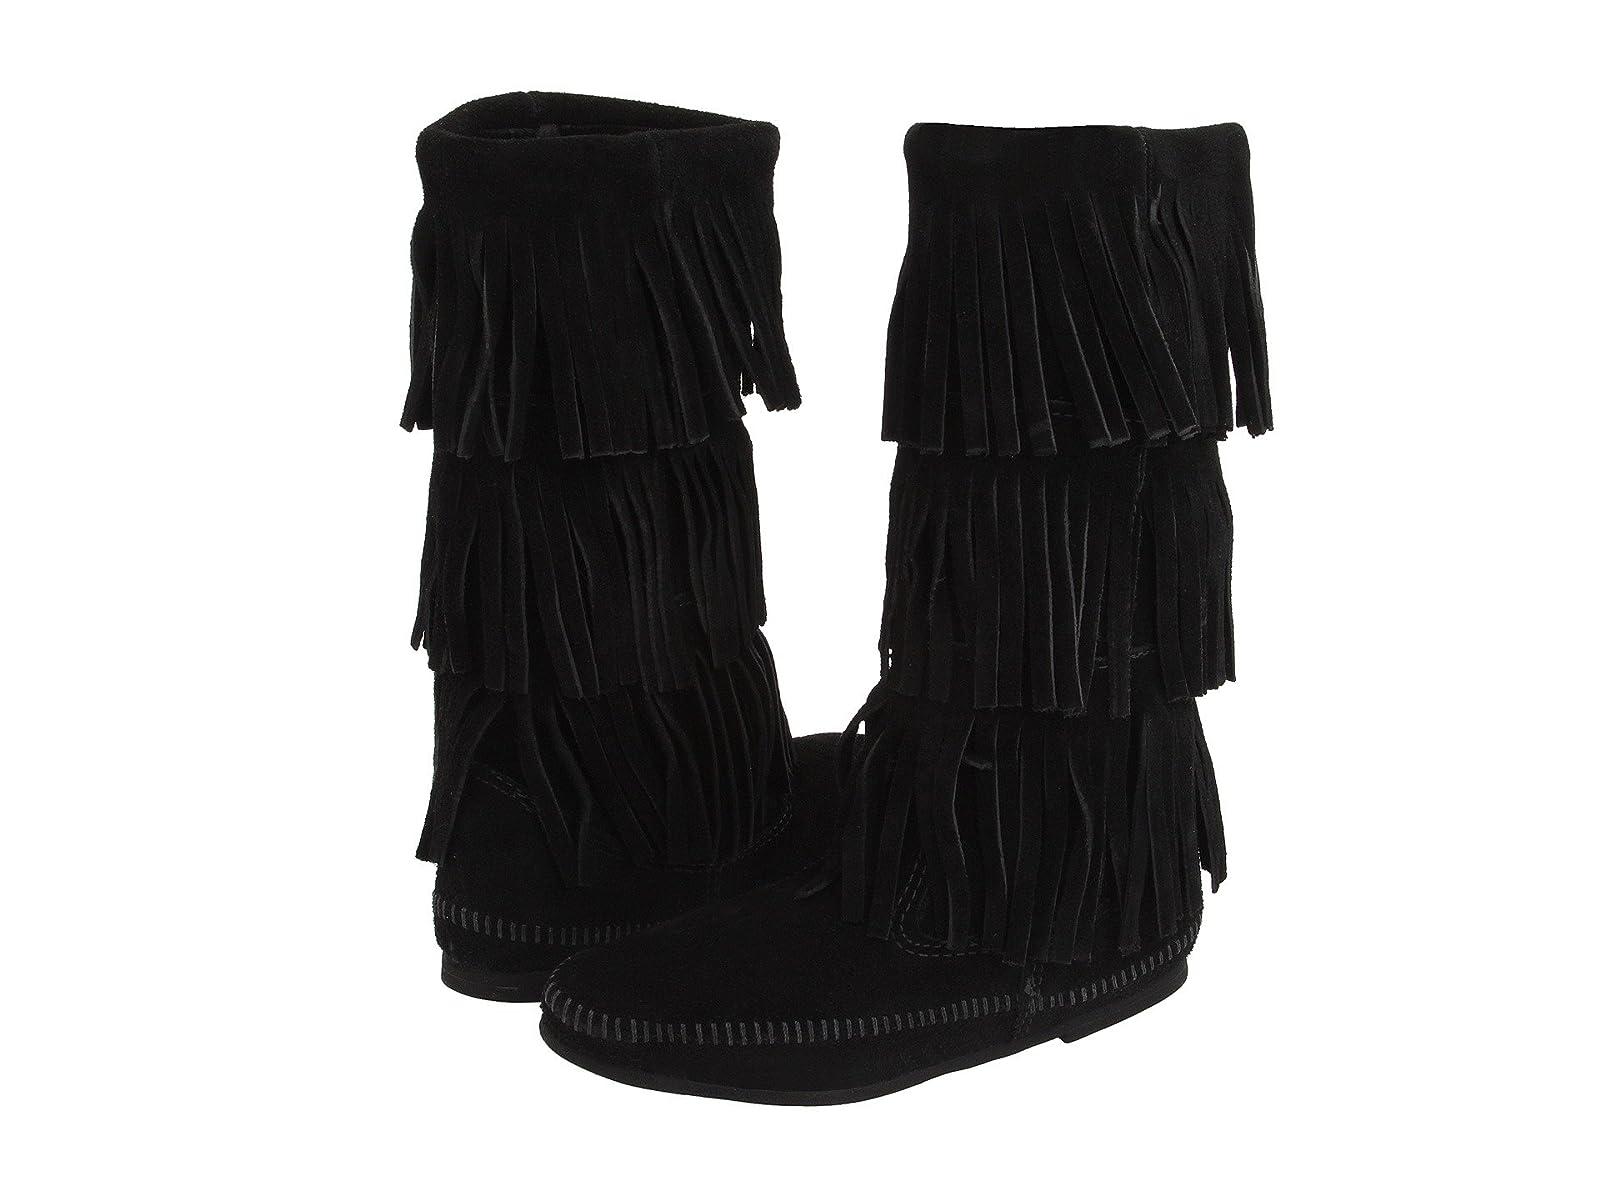 Minnetonka Calf Hi 3-Layer Fringe BootEconomical and quality shoes